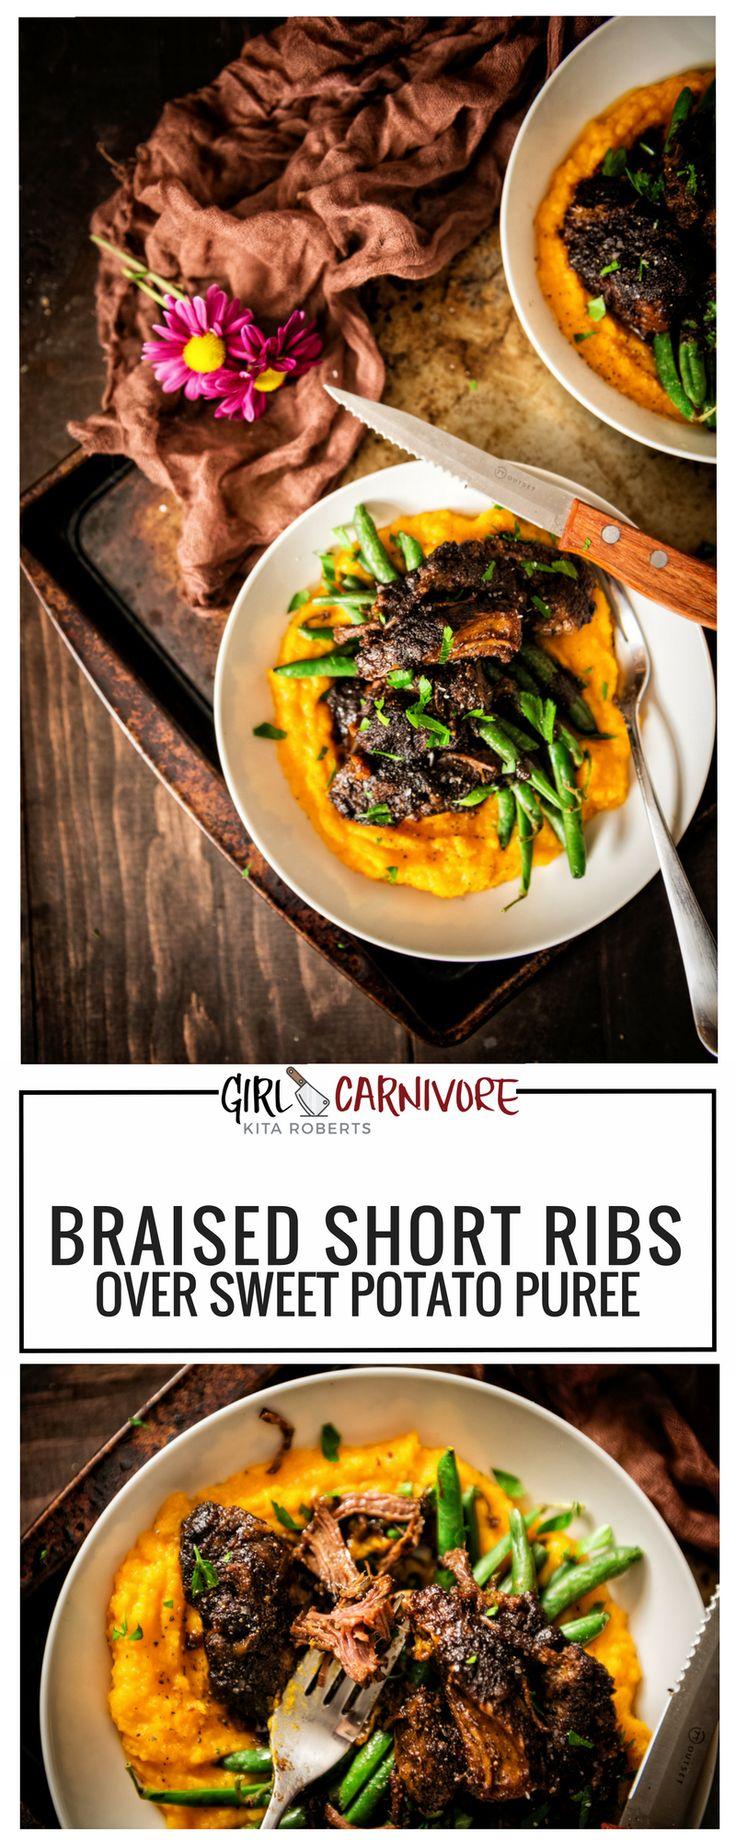 Braised Short Ribs over Sweet Potato Puree